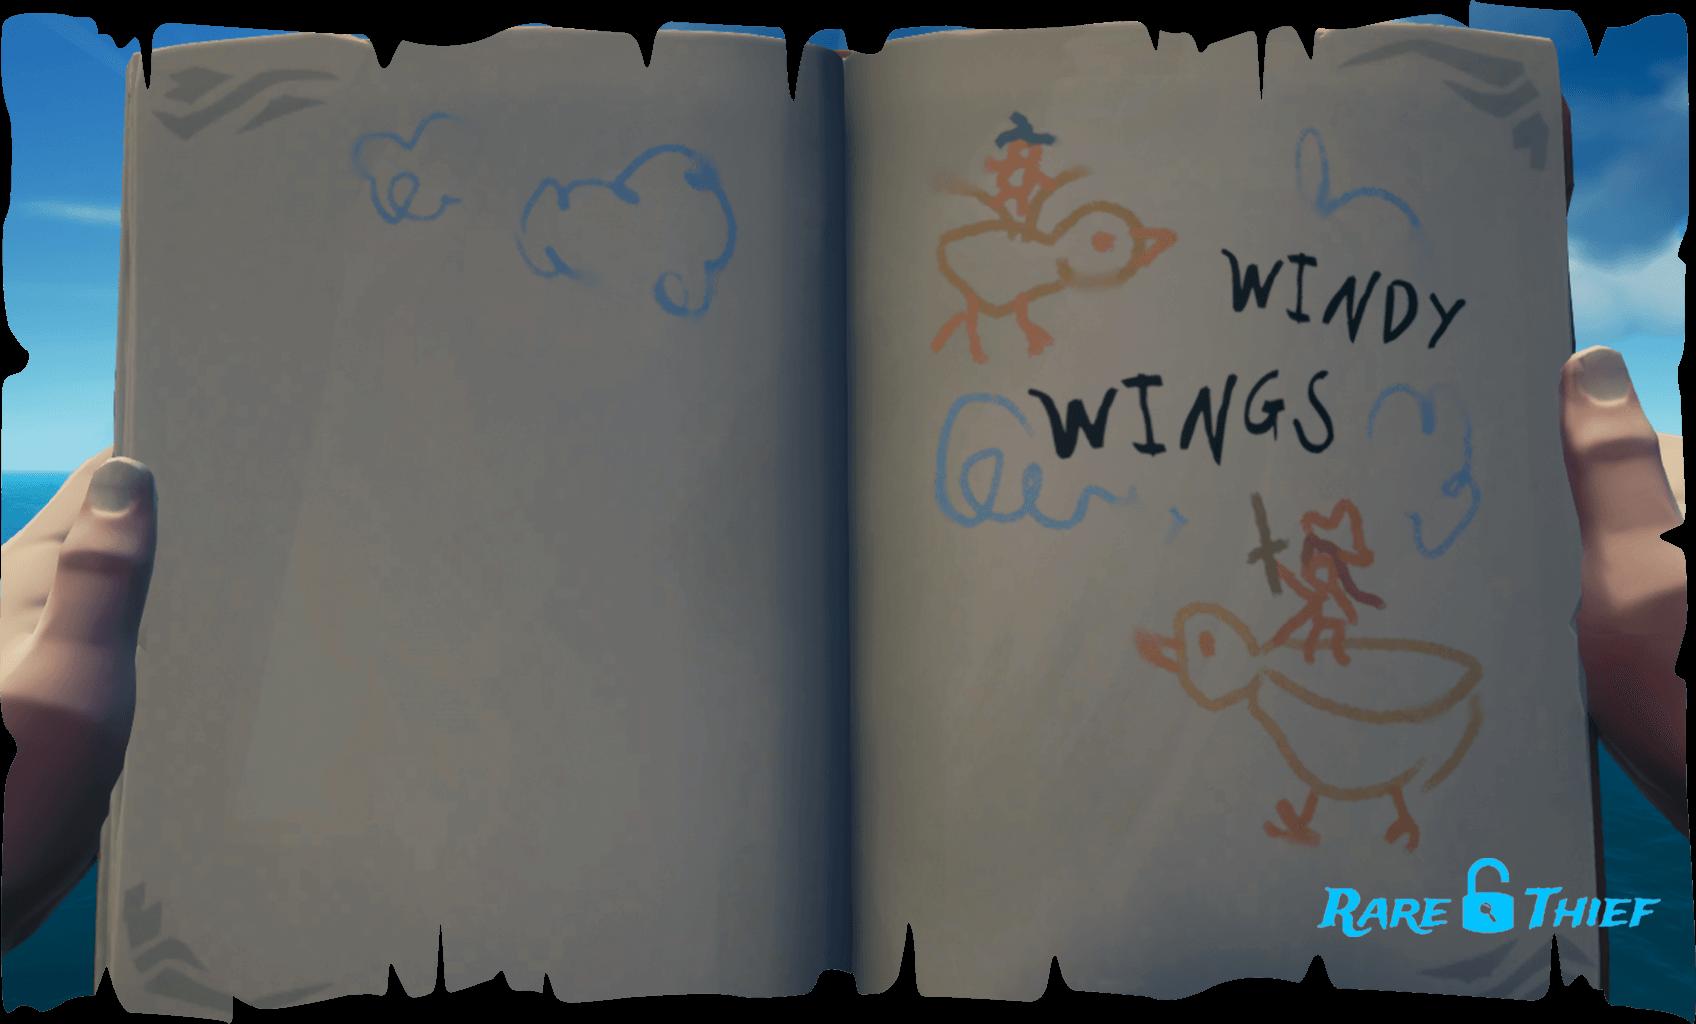 Legendary Storyteller Windy Wings